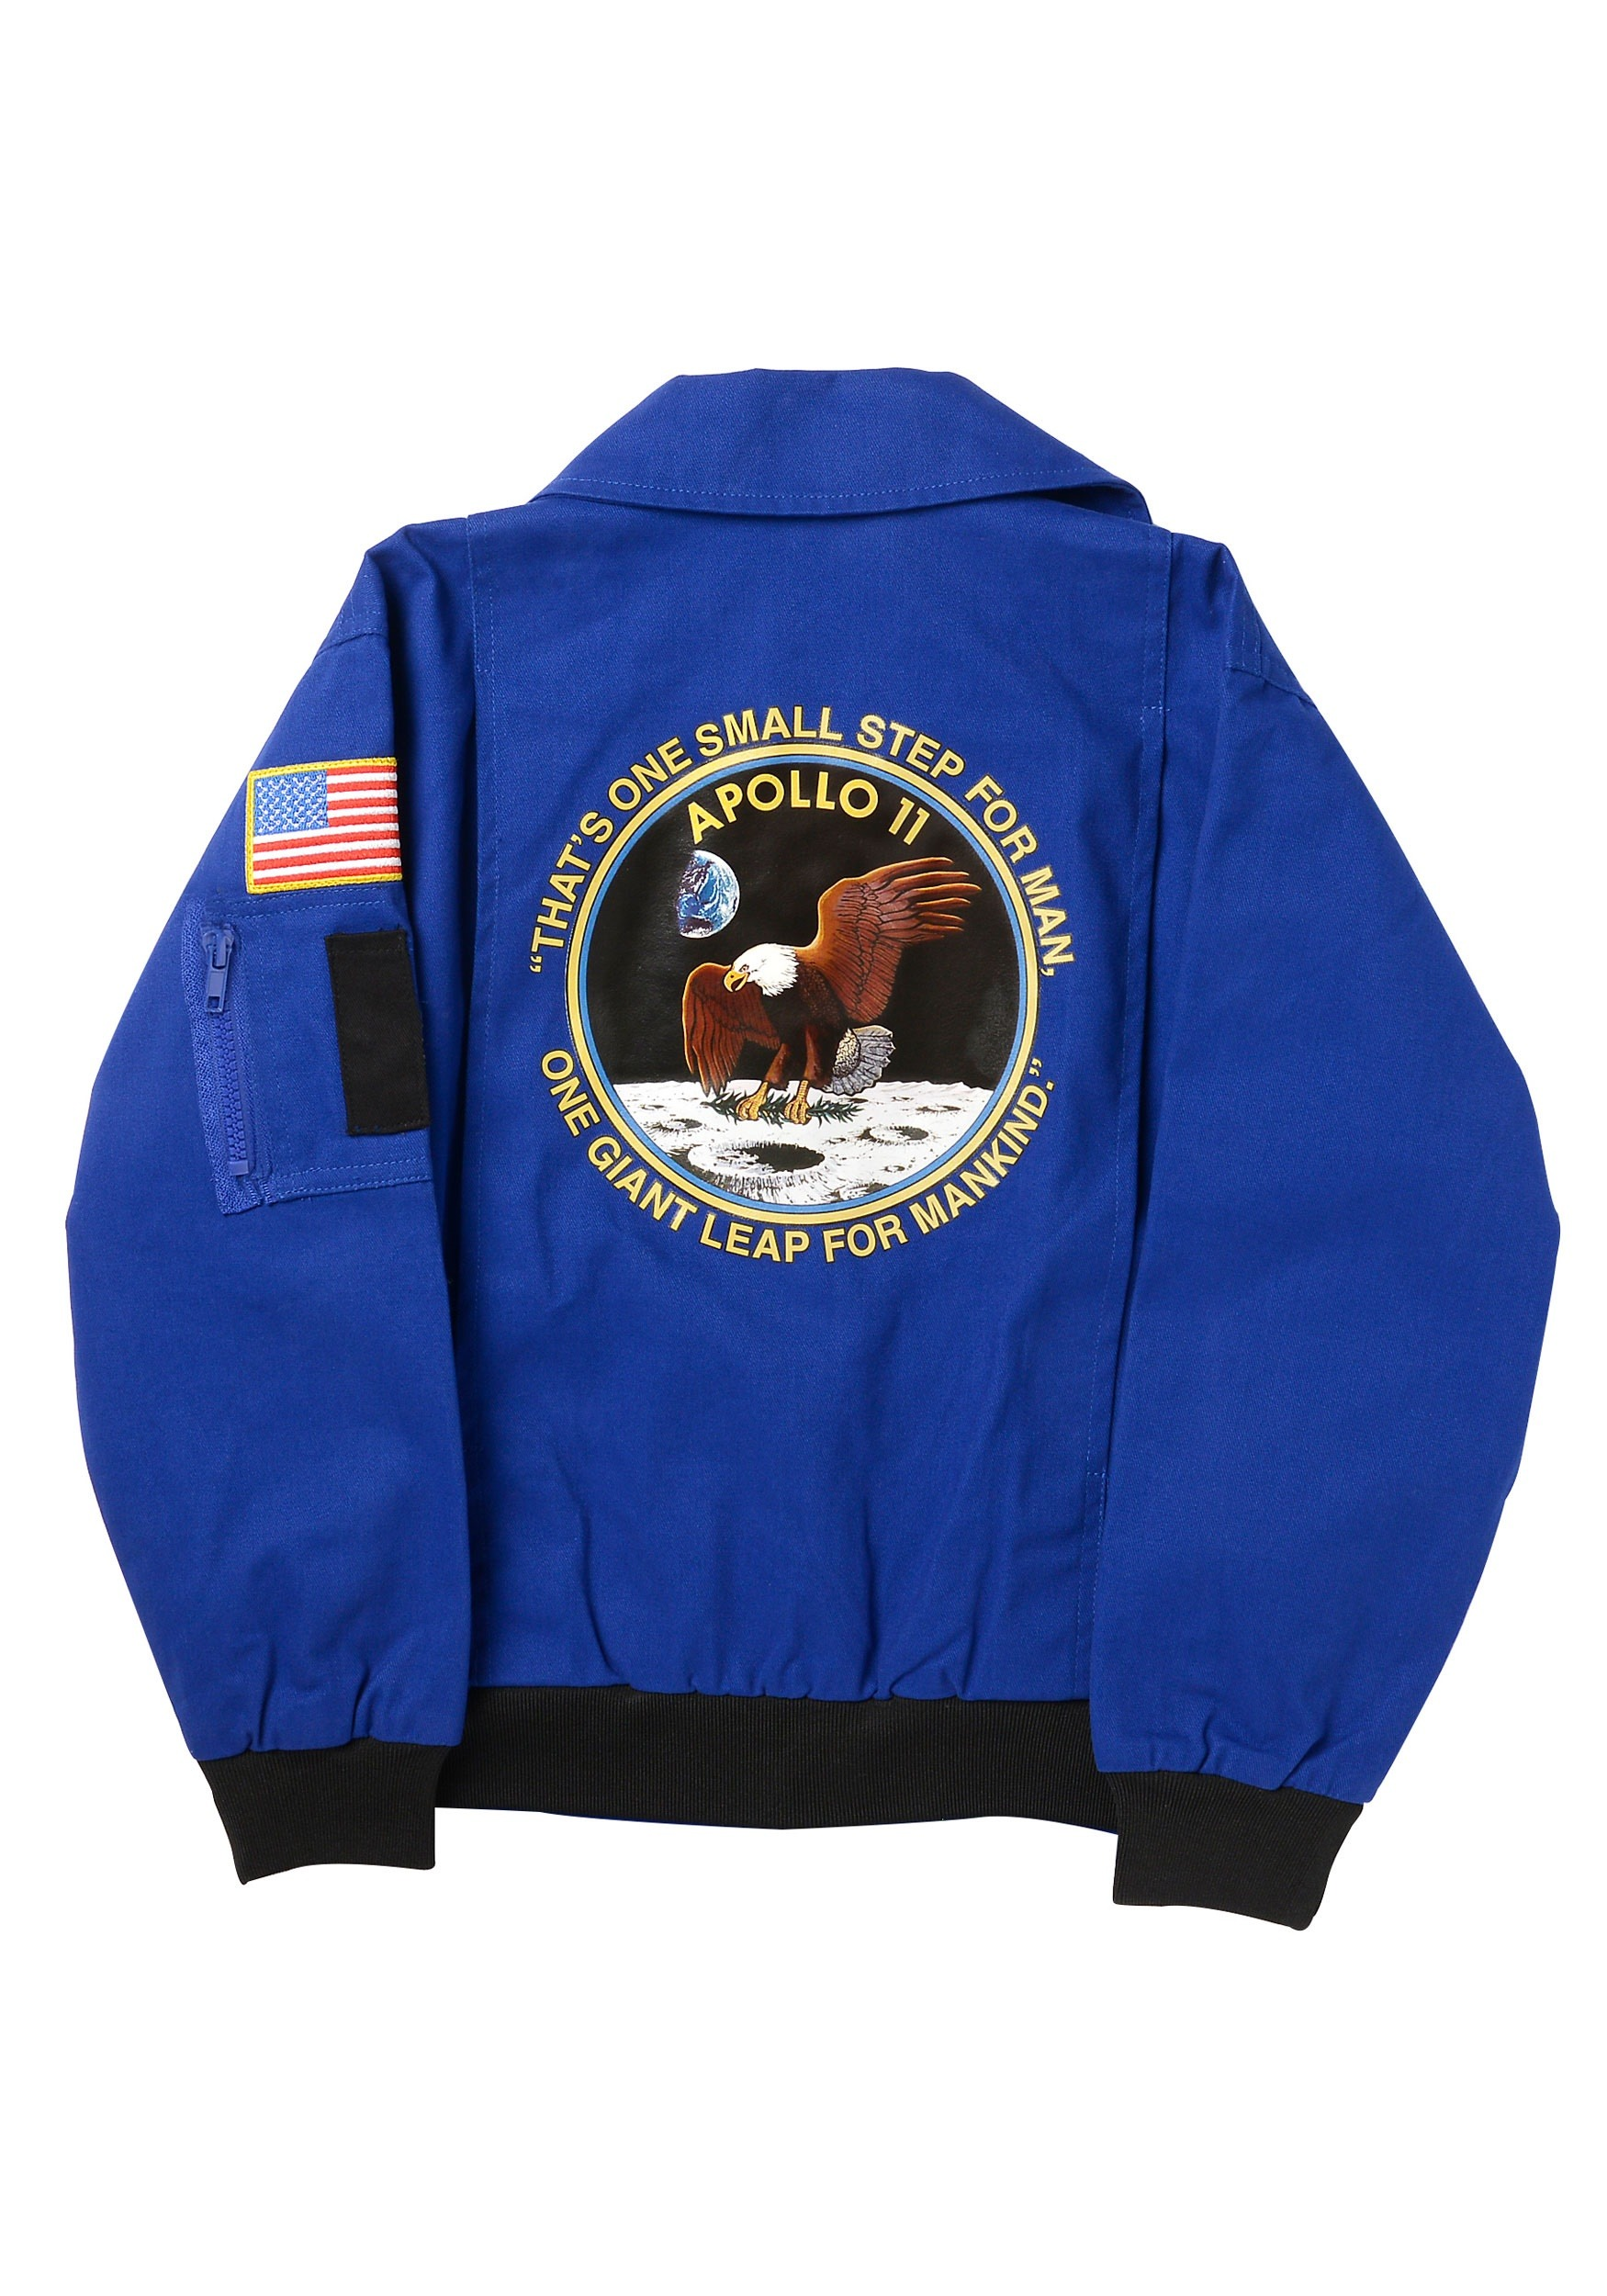 nasa apollo flight jacket - photo #24